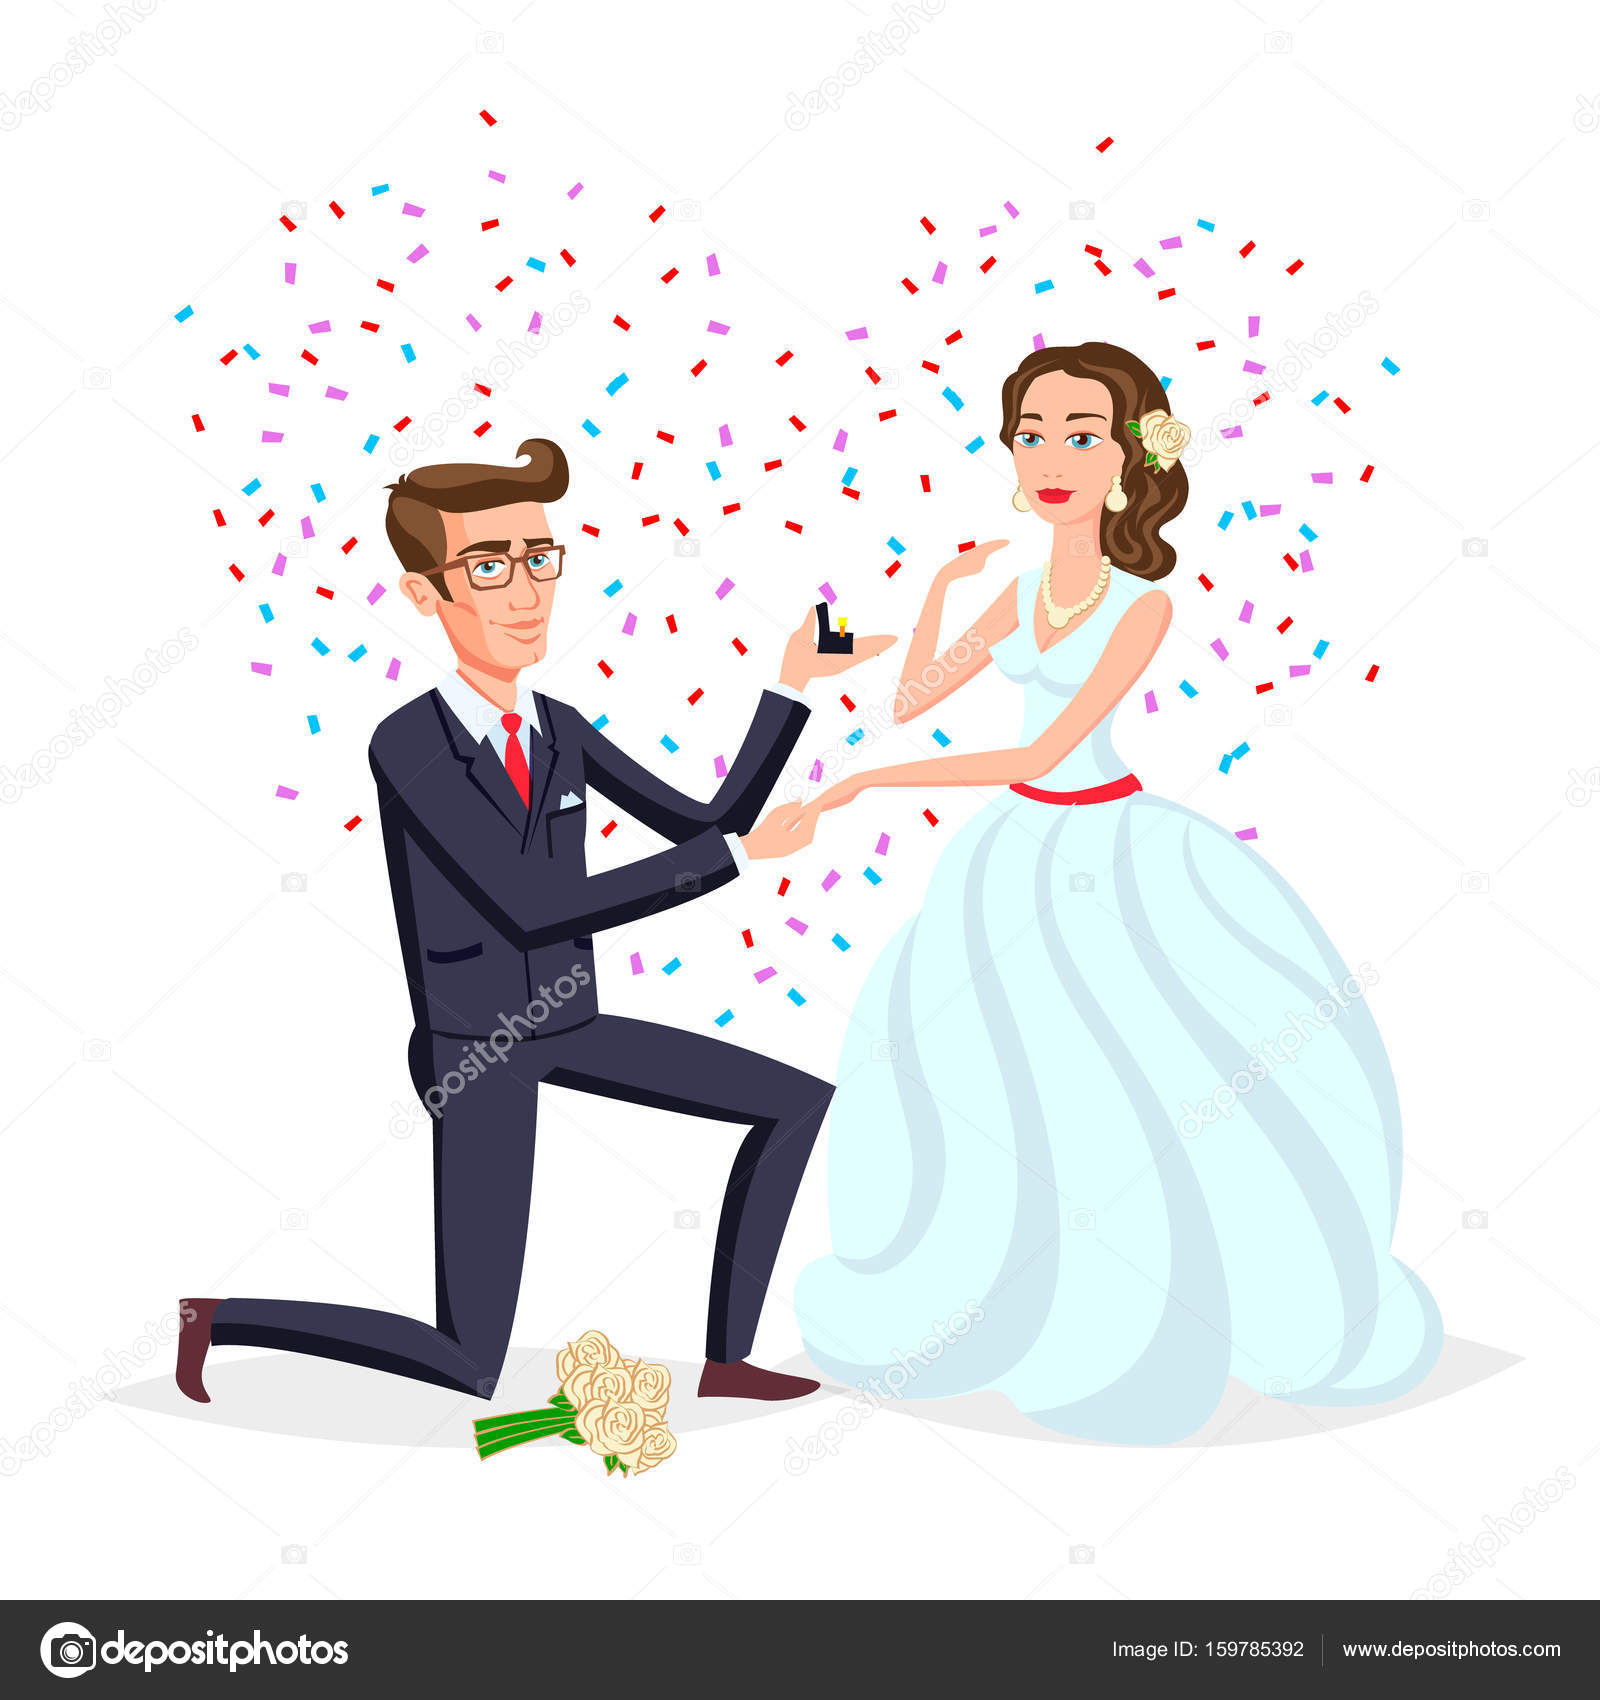 Bride And Groom As Love Wedding Couple Illustration Cartoon Husband